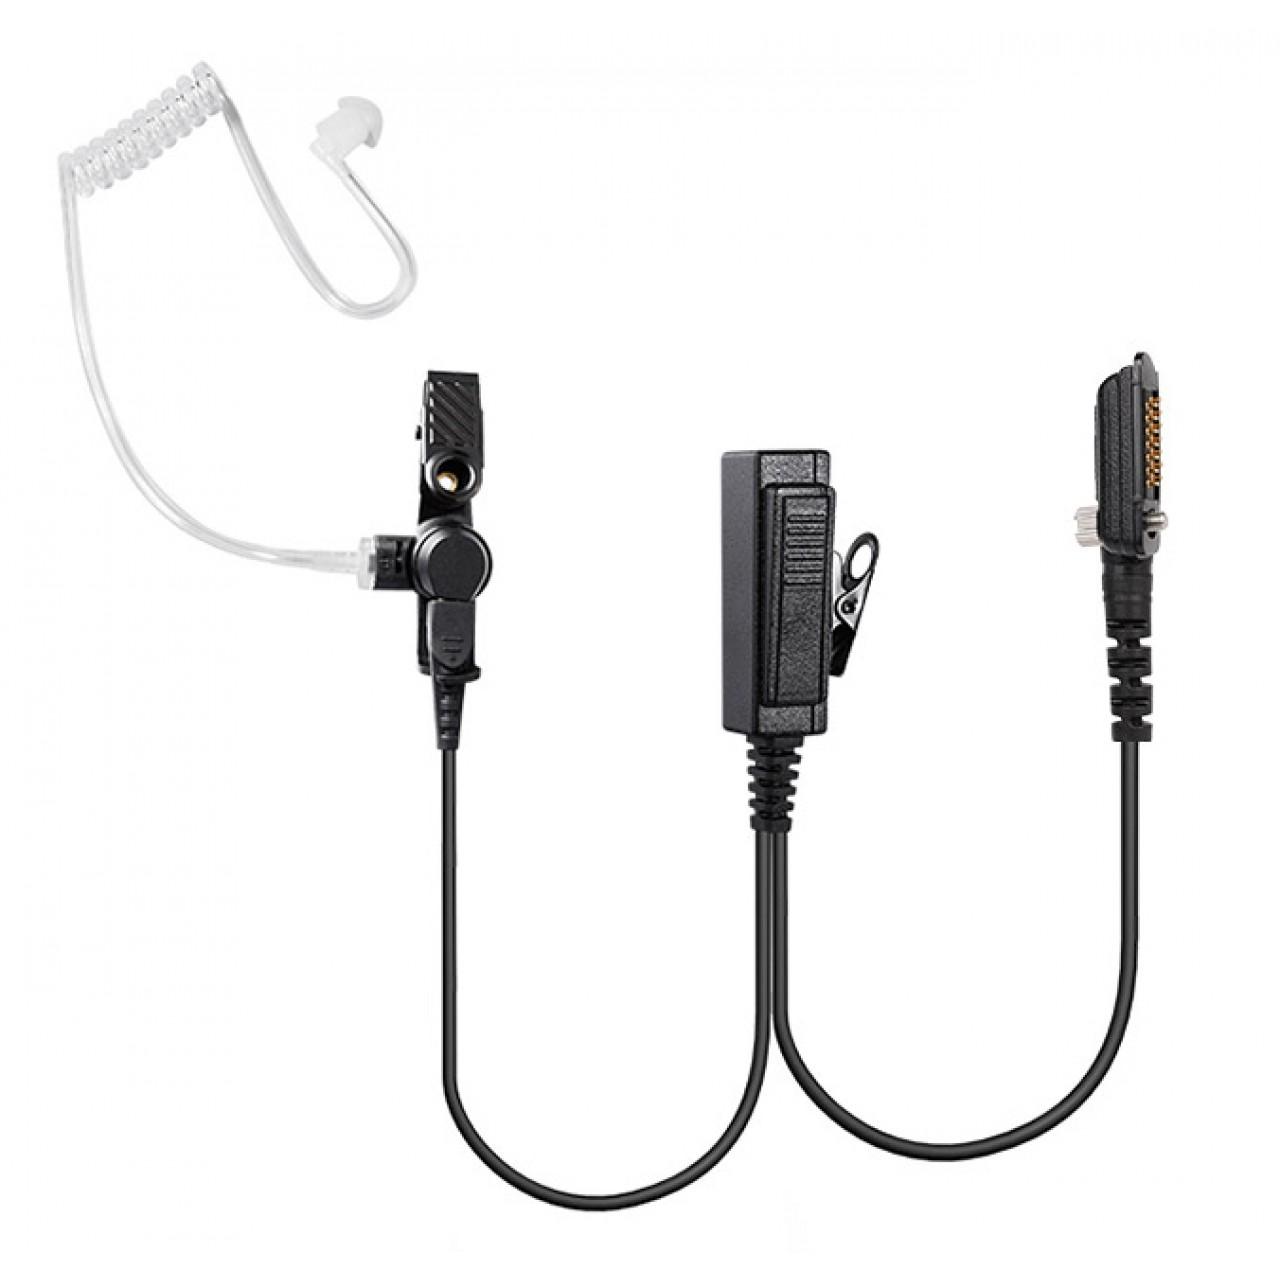 EP-RA4238T-I5 Headsets and earphones - ICOM